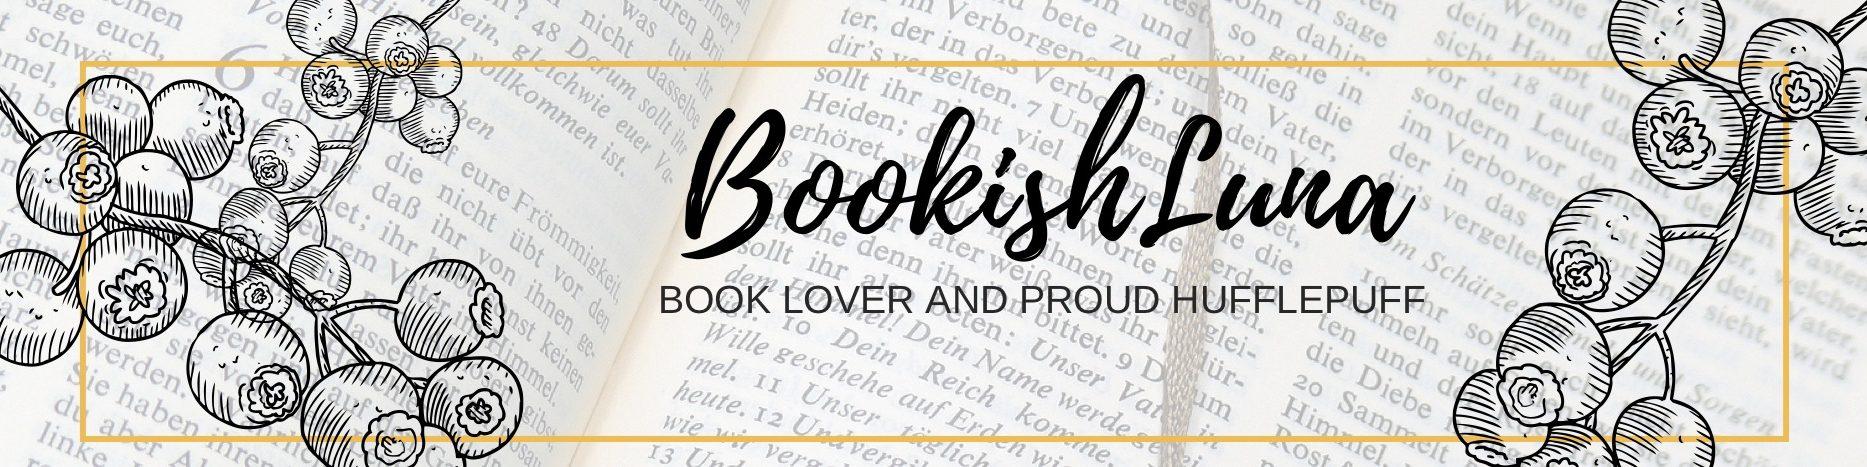 Bookish Luna